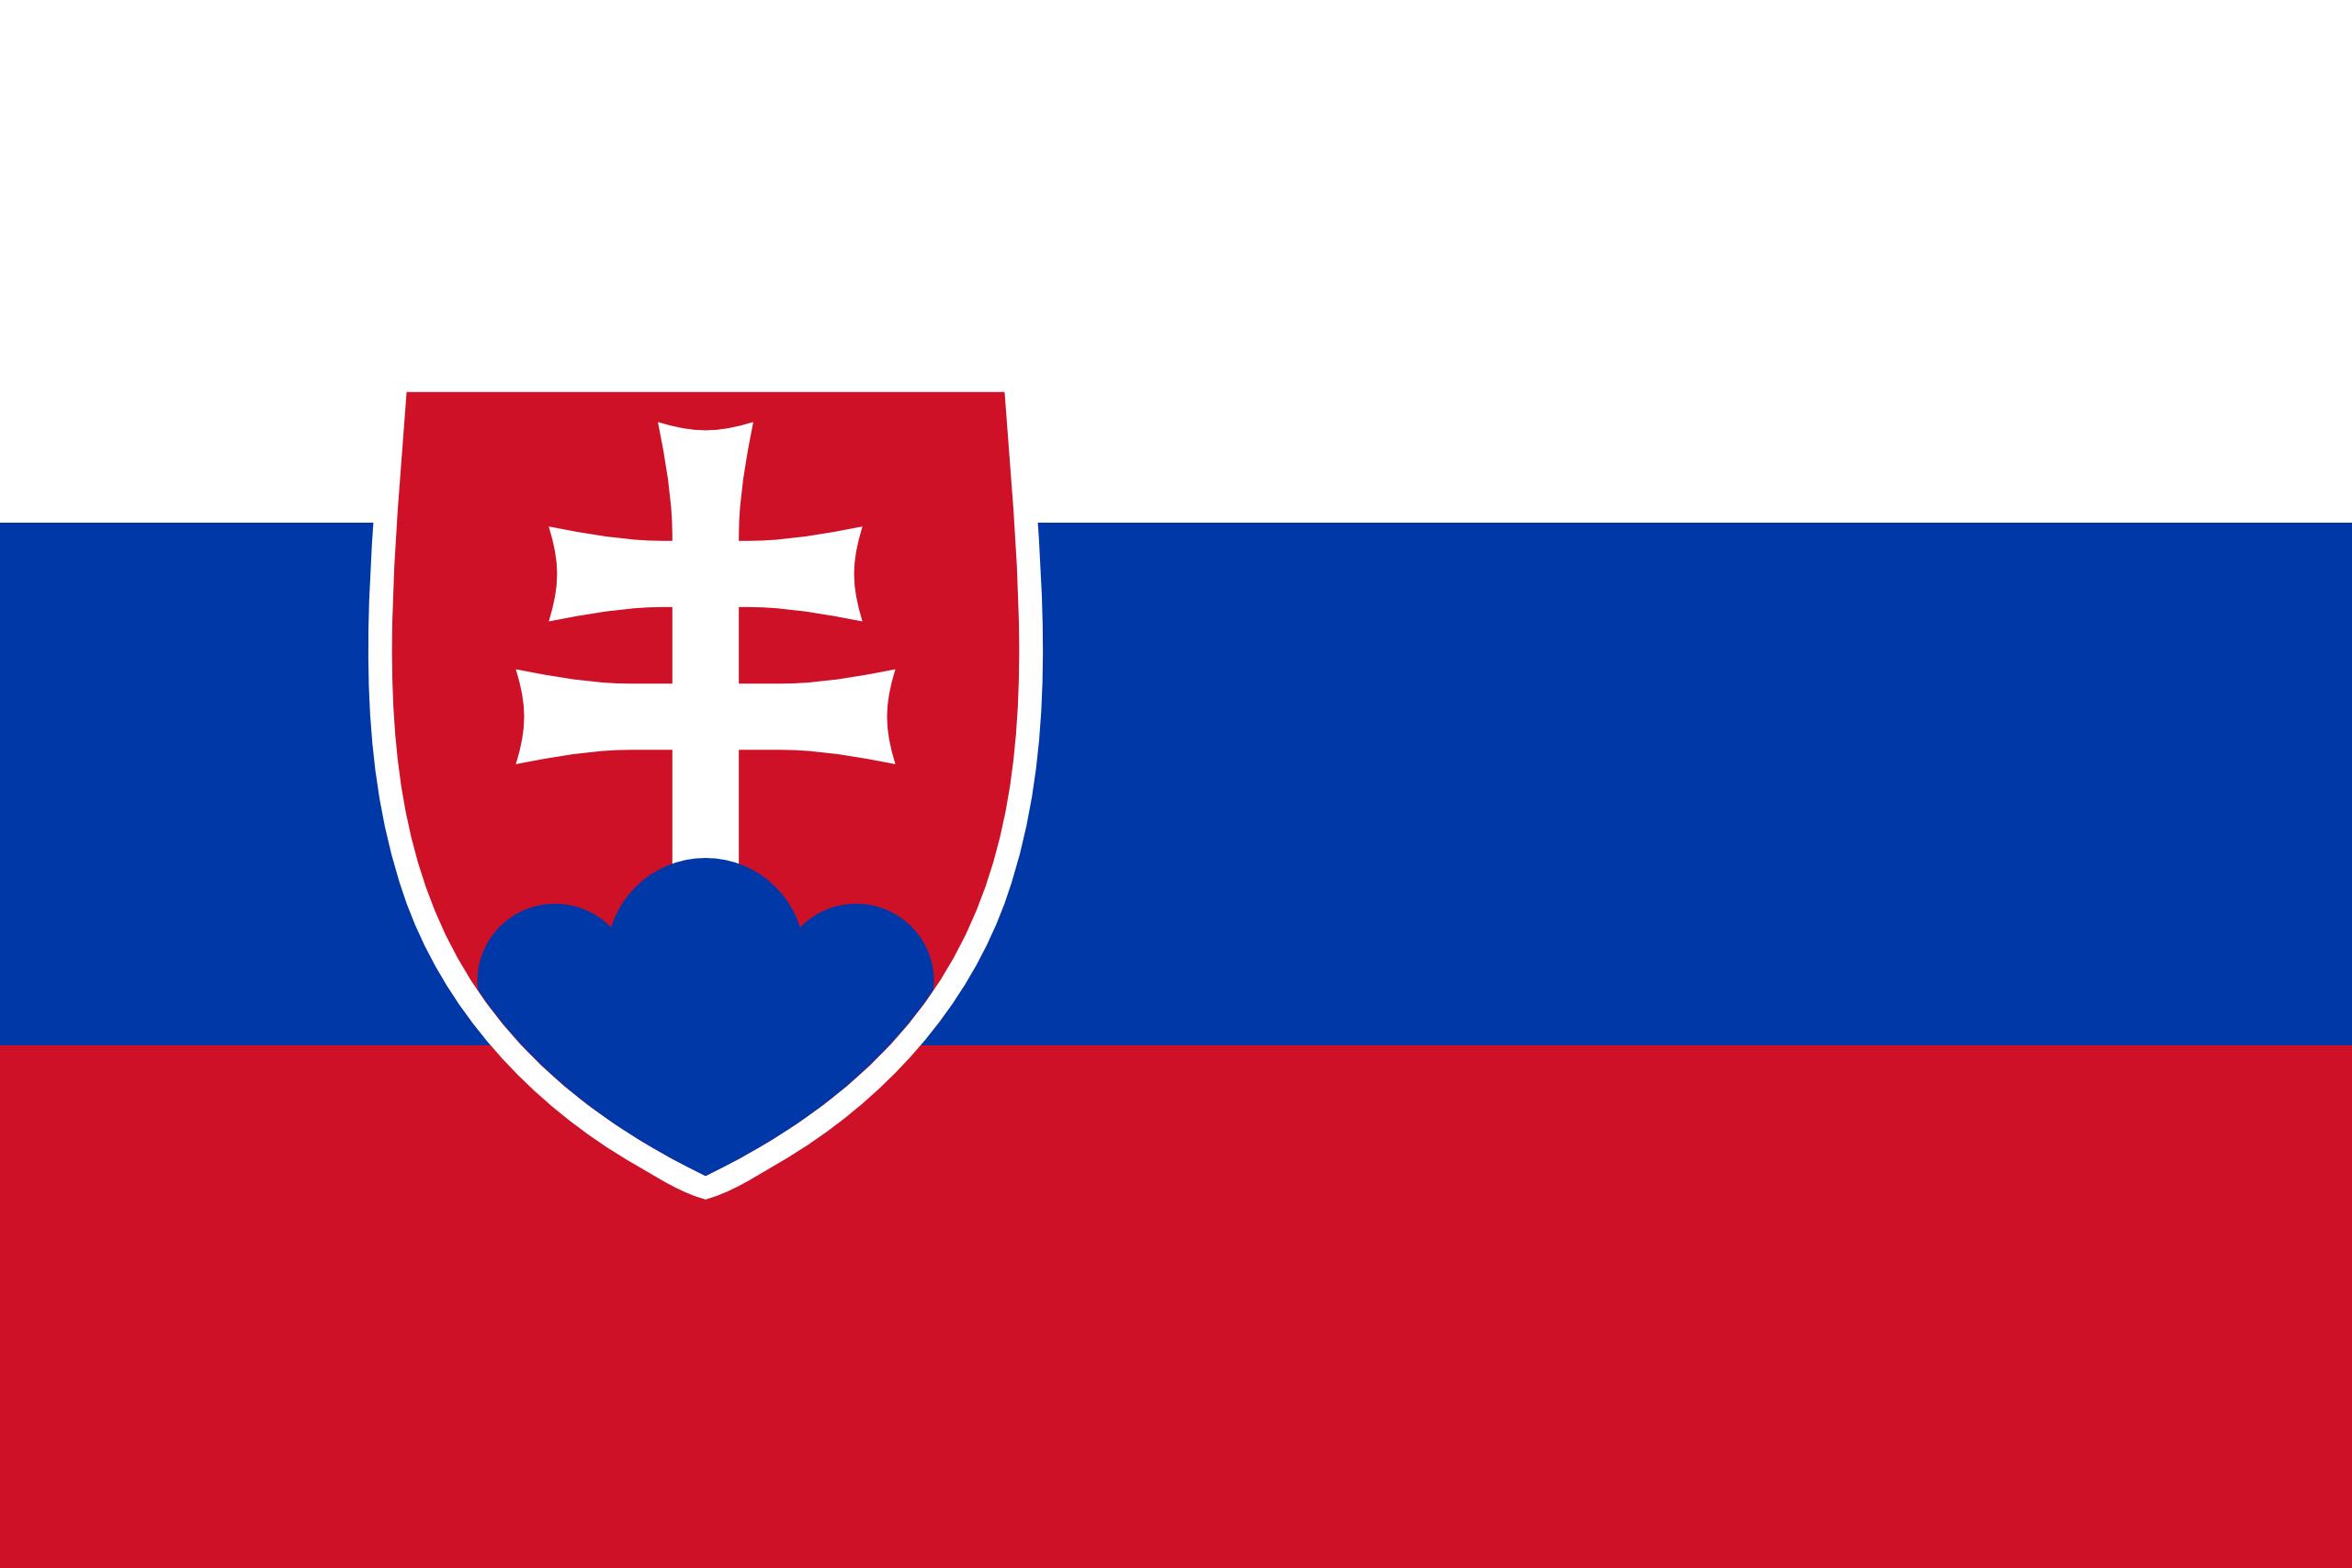 Embassy of the Slovak Republic